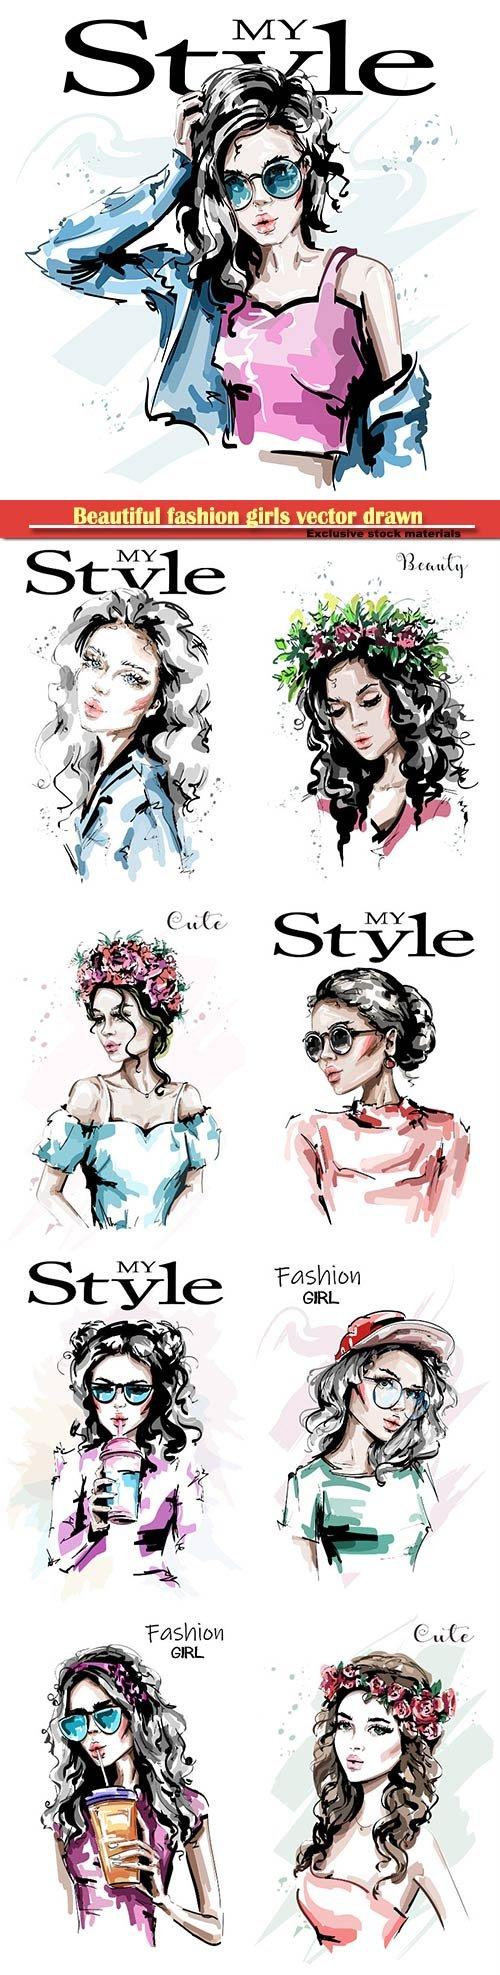 Beautiful fashion girls vector drawn illustrations